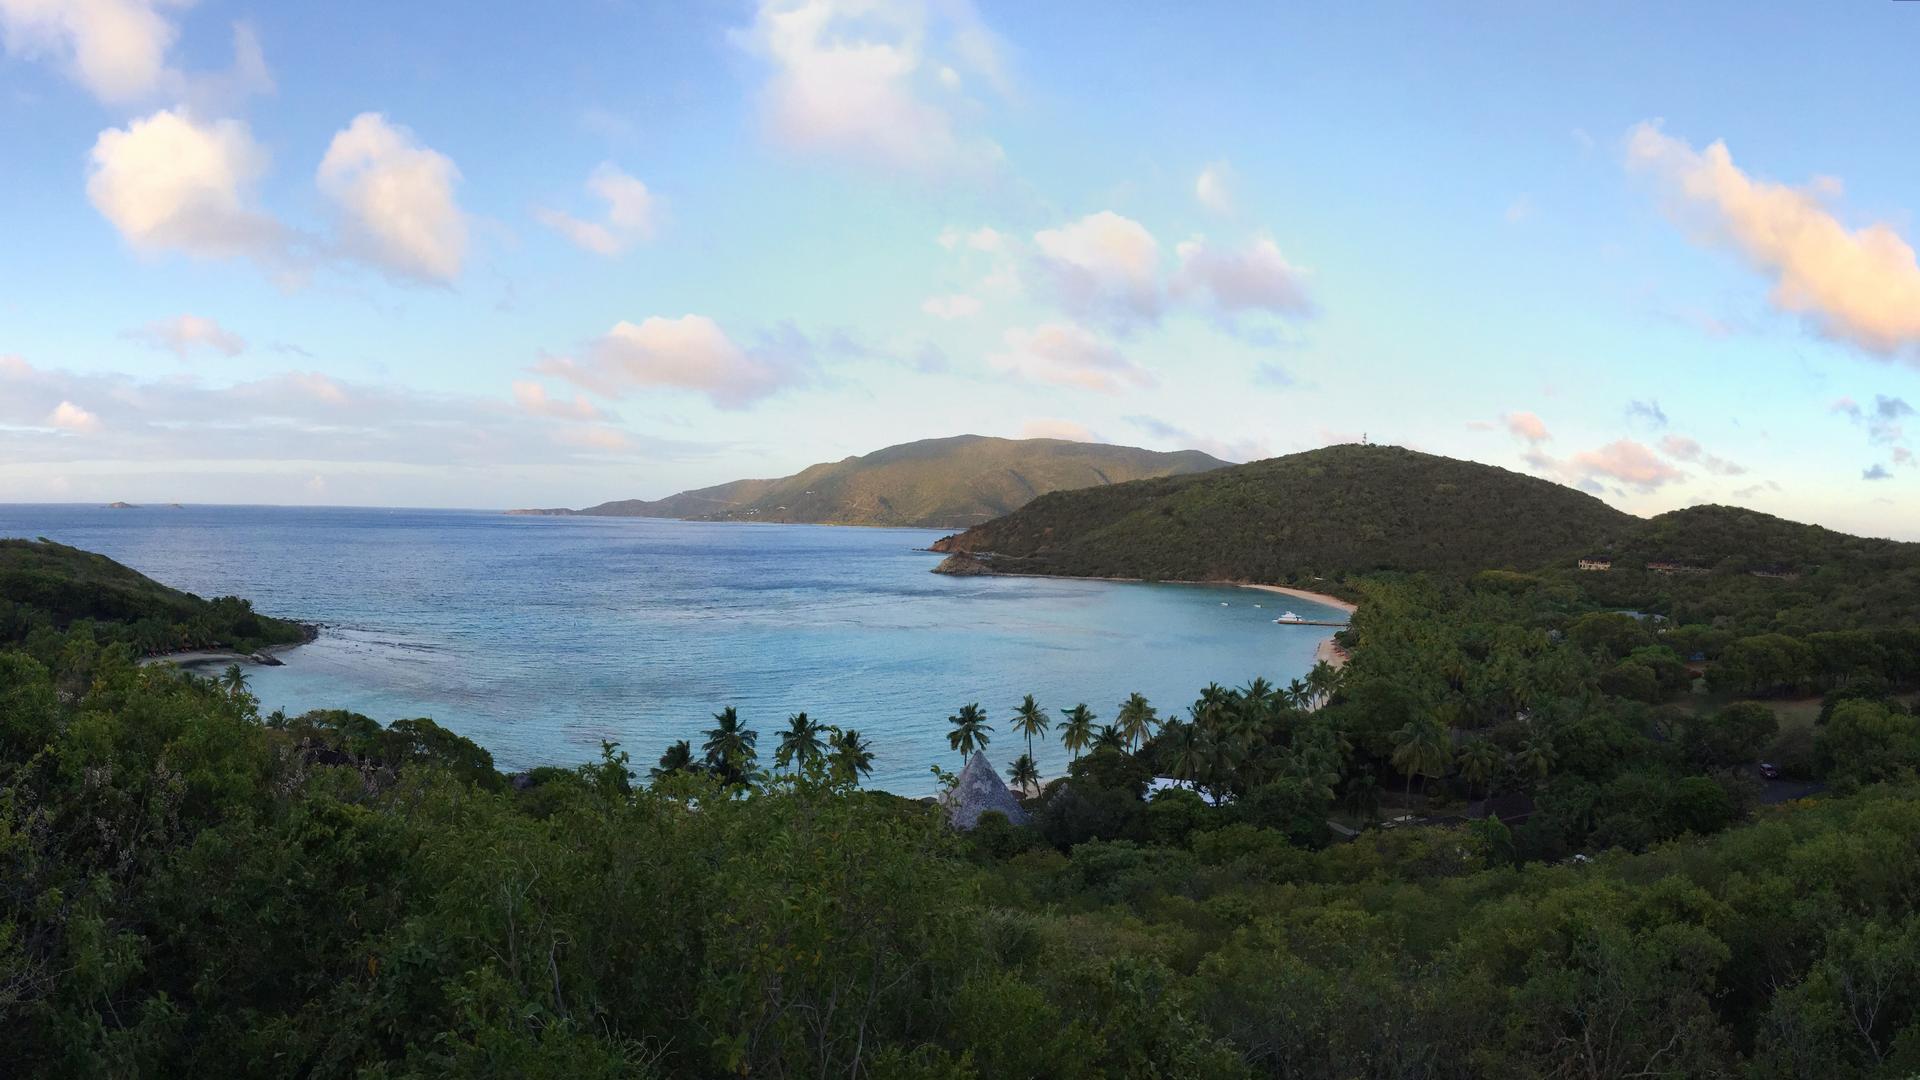 A view in Virgin Islands (British)